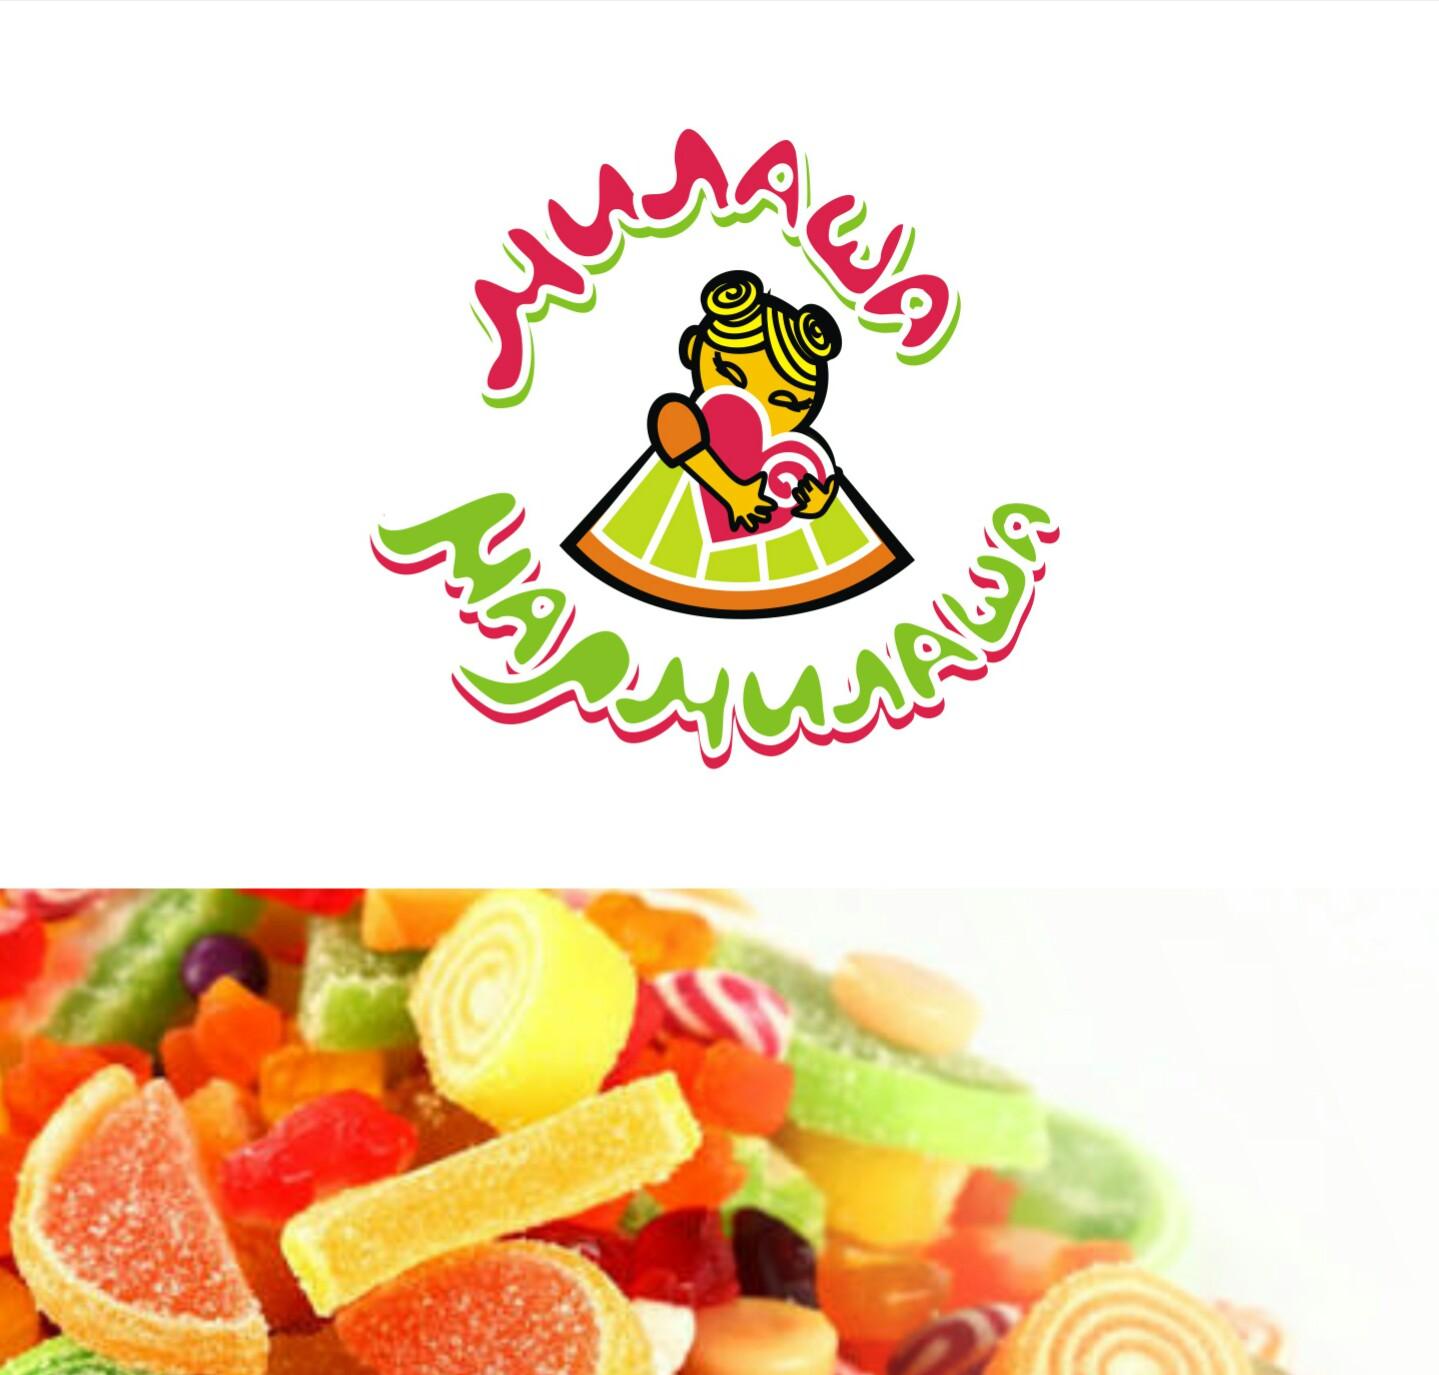 "Логотип для товарного знака ""Милаша-Мармилаша"" фото f_2185877e47b4a794.jpg"